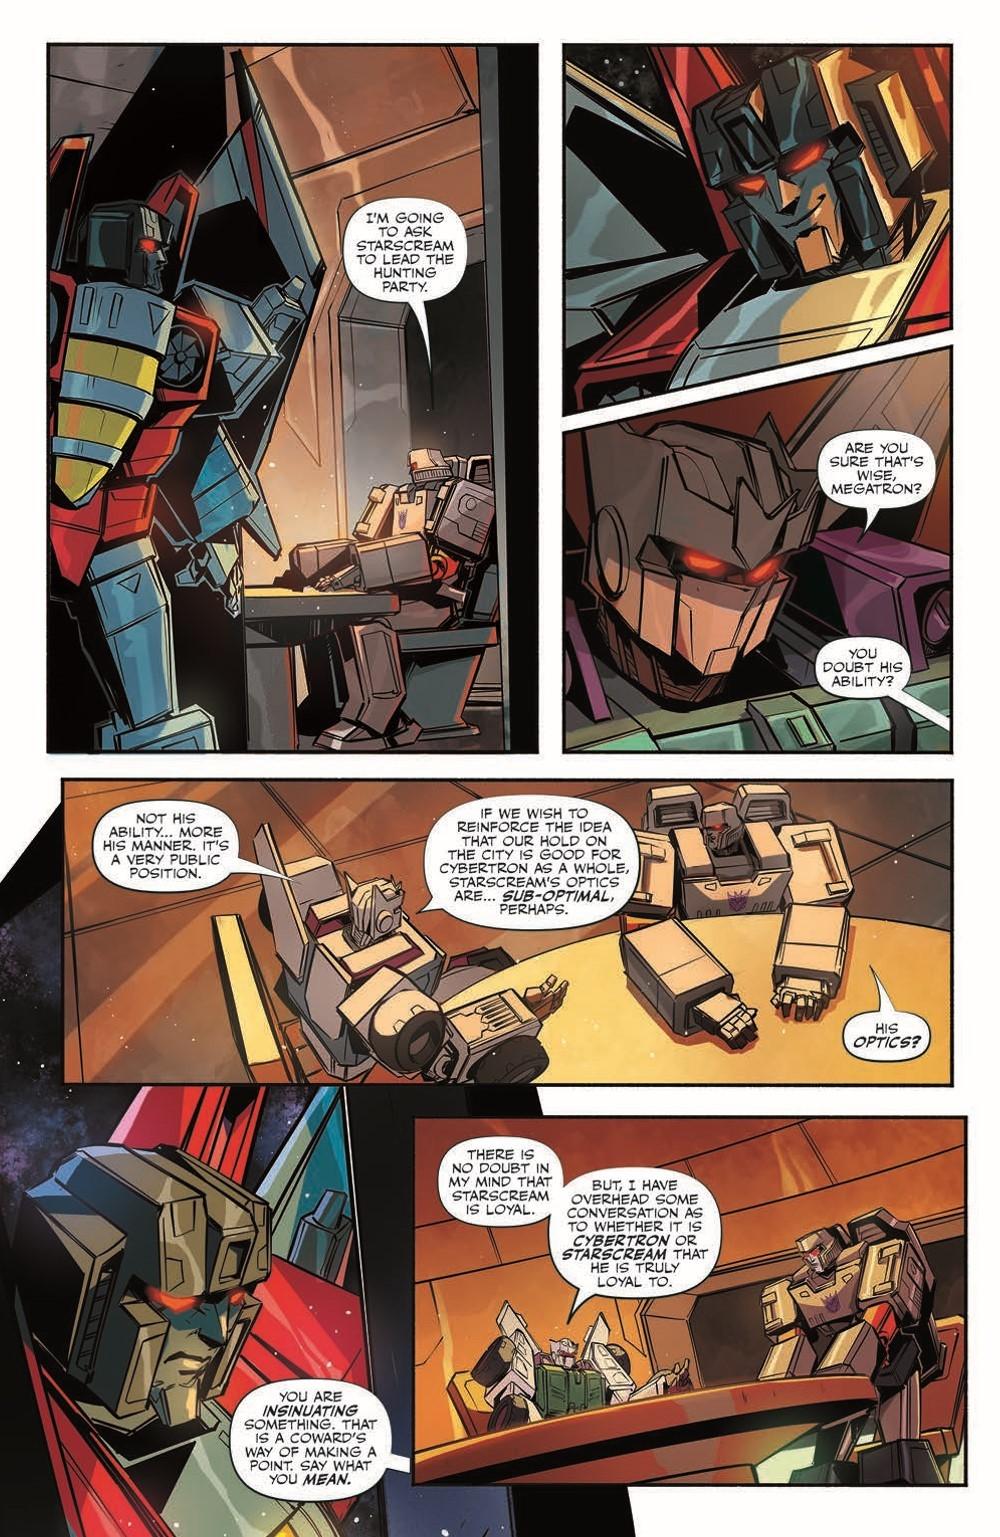 TFHalloween2021_pr-4 ComicList Previews: TRANSFORMERS HALLOWEEN SPECIAL #1